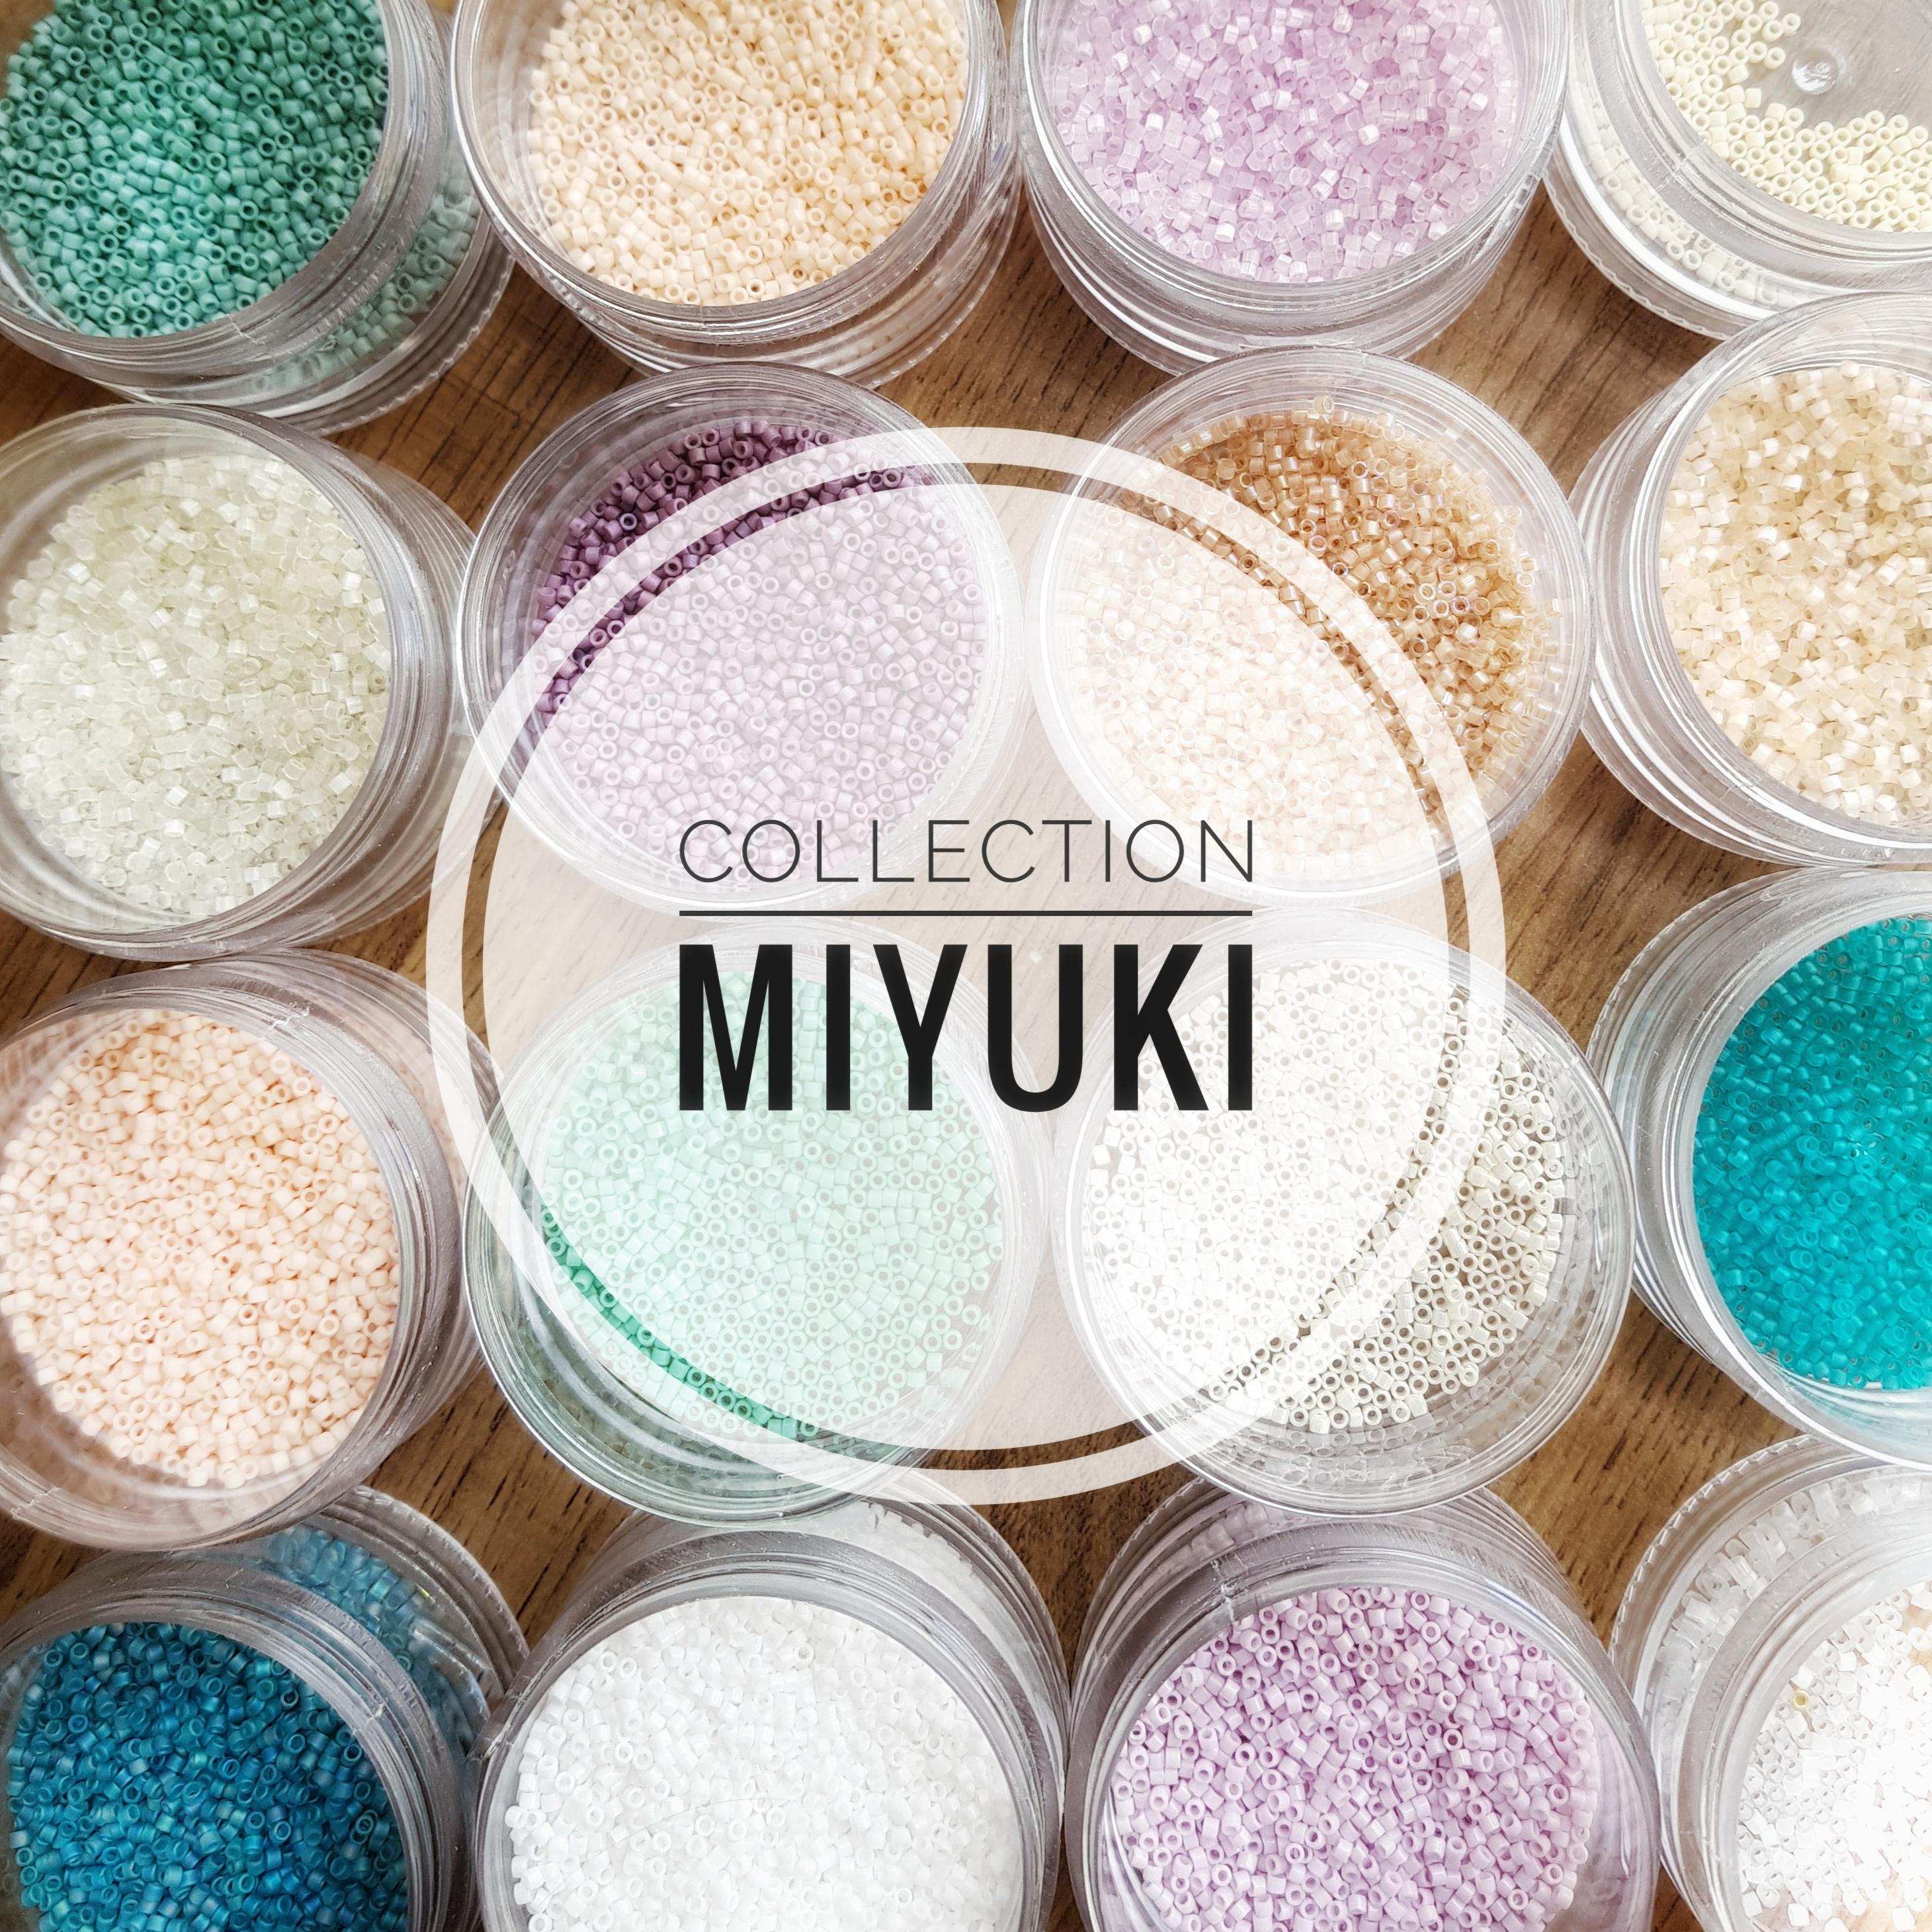 Gebetnout-bijoux-fantaisie-lyon-mode-tendance-bijouterie-femme-Oullins-artisan-catégorie-miyuki